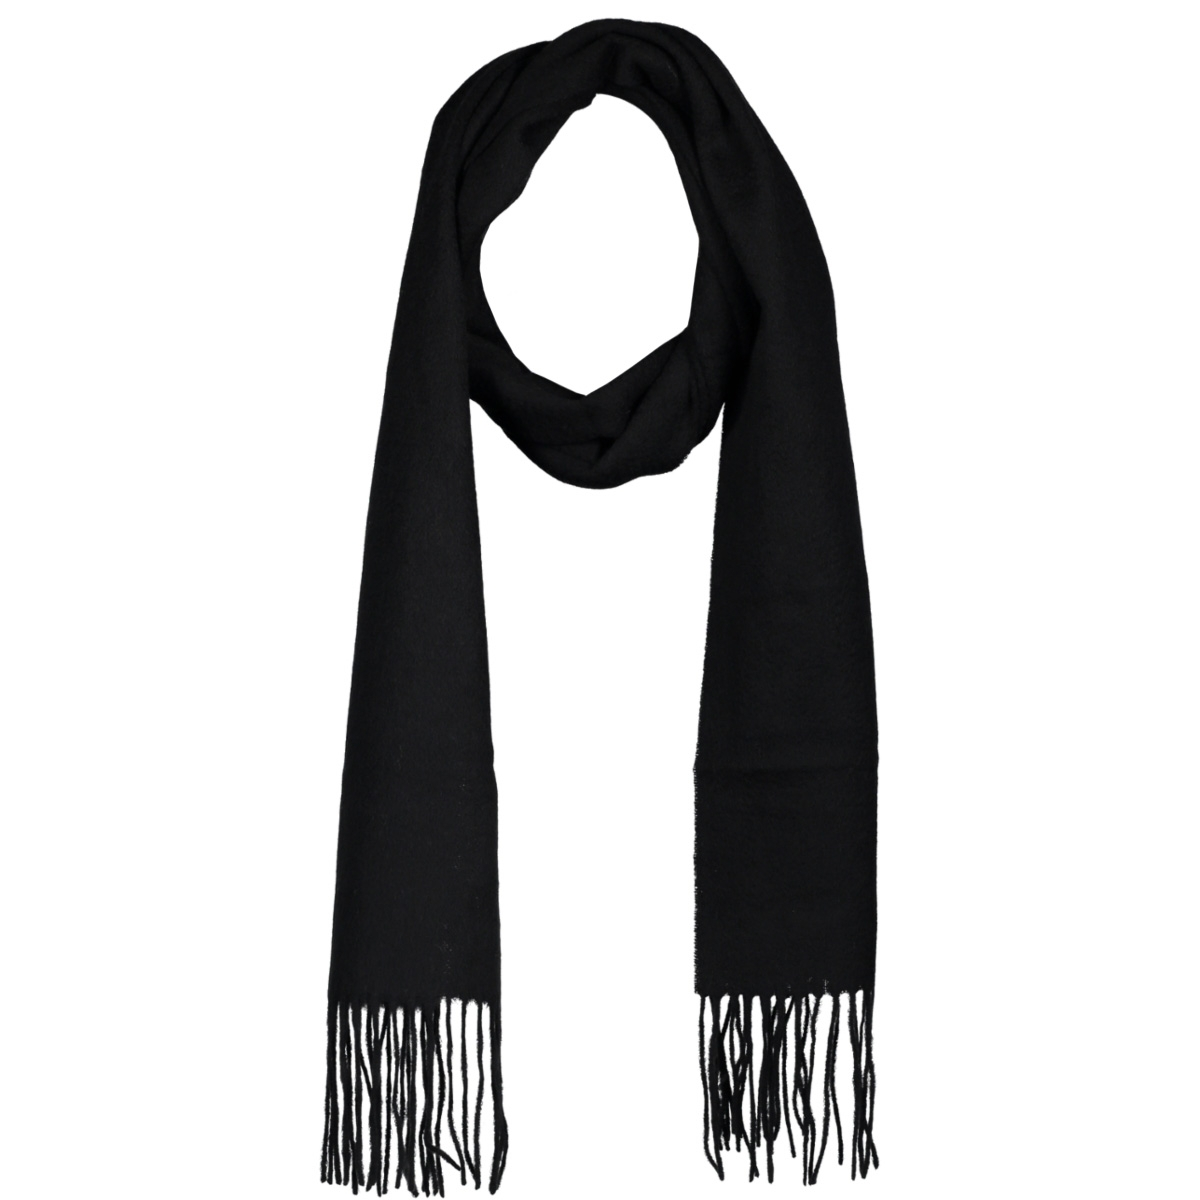 30202709 matinique sjaal 20050 black